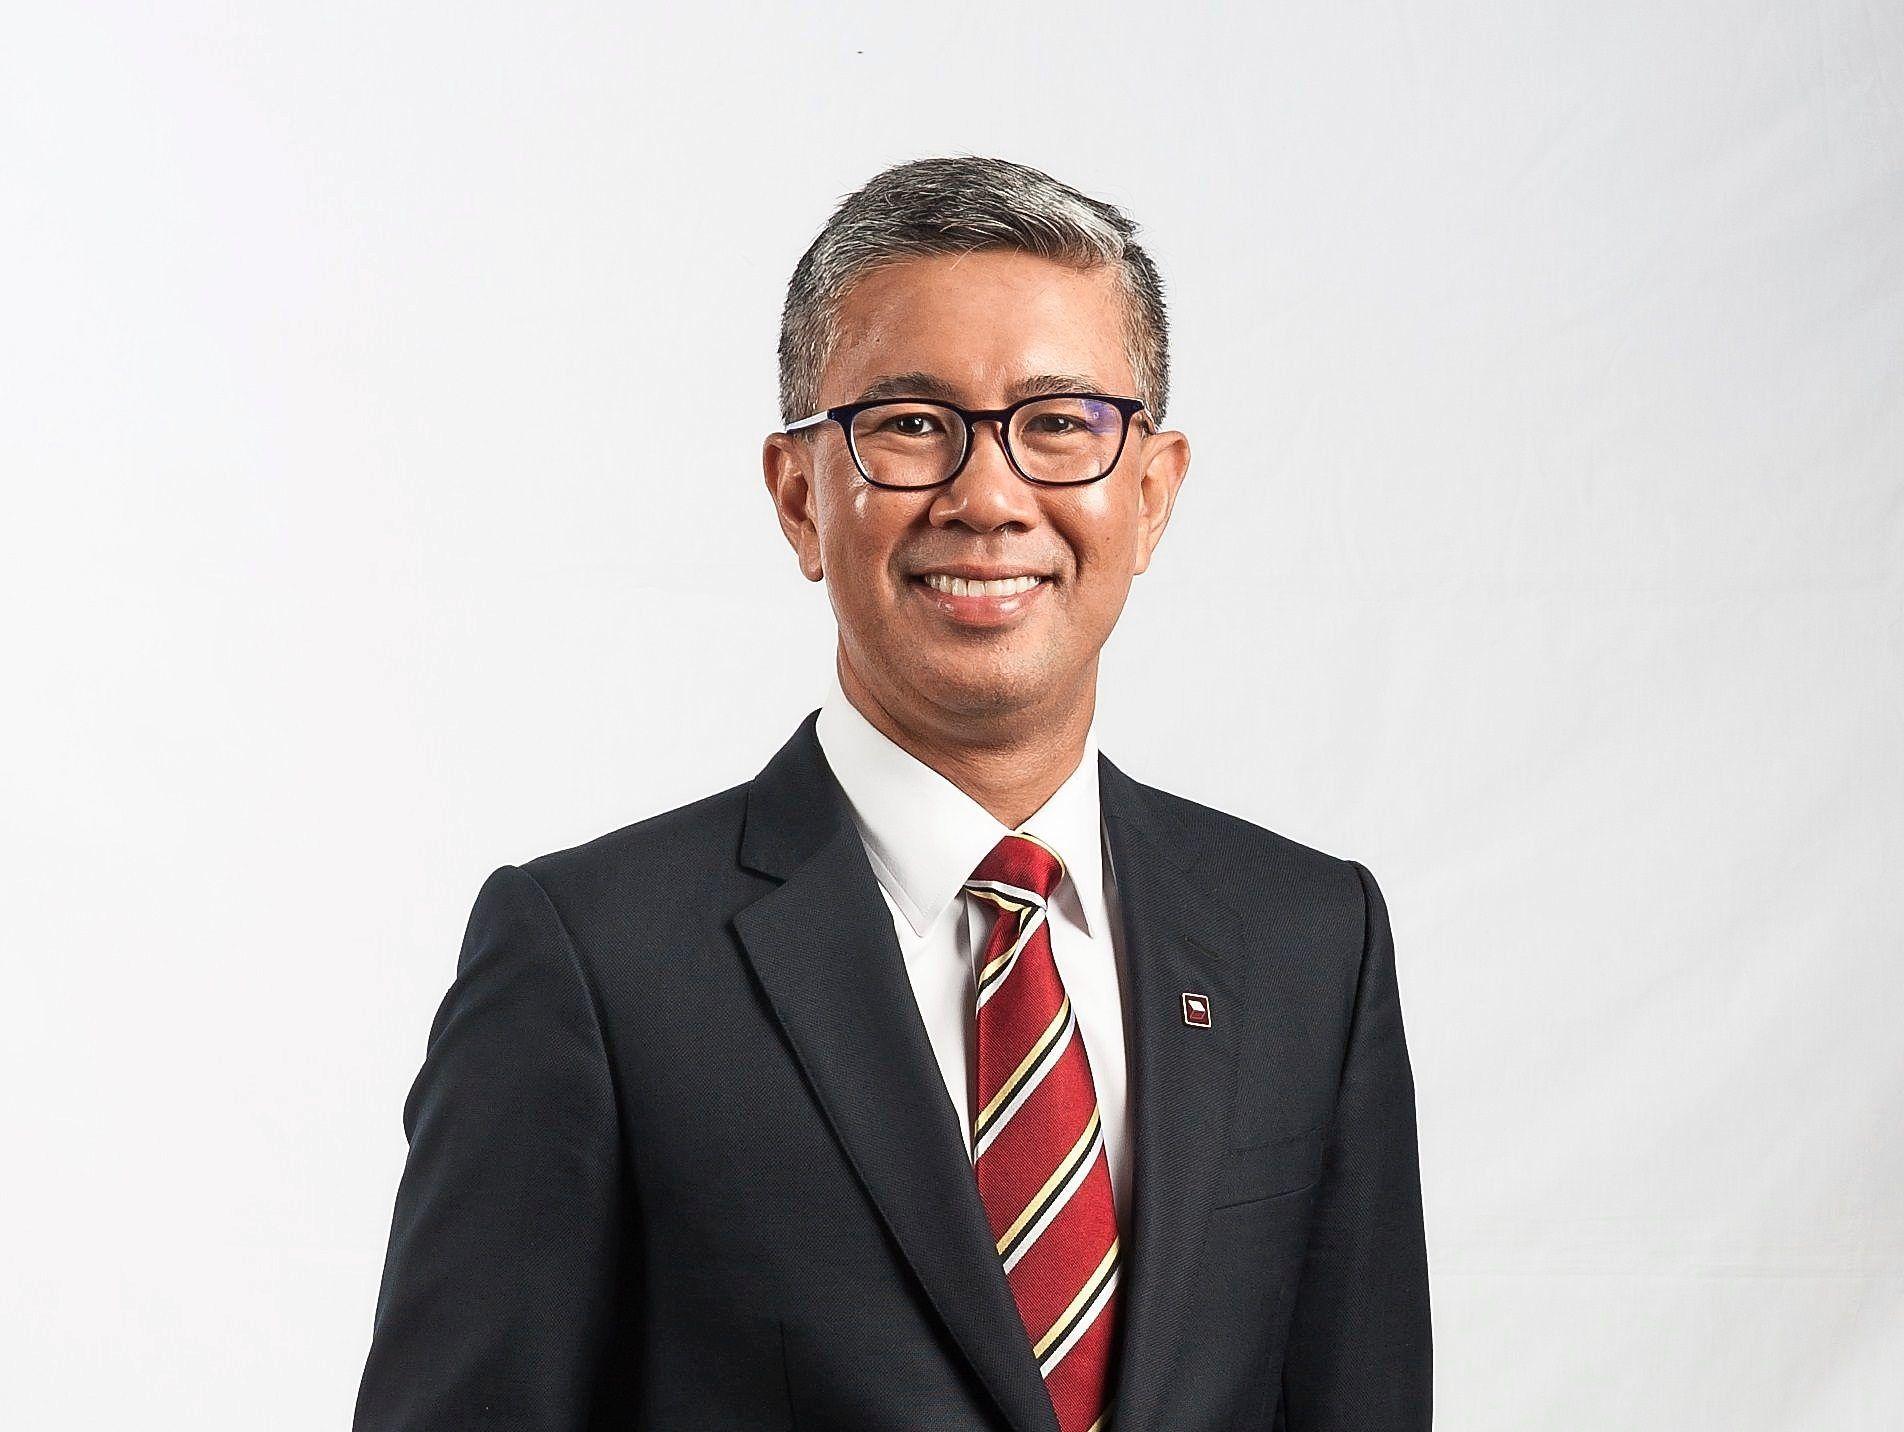 CIMB Group Holdings Bhd group CEO Tengku Datuk Seri Zafrul Aziz